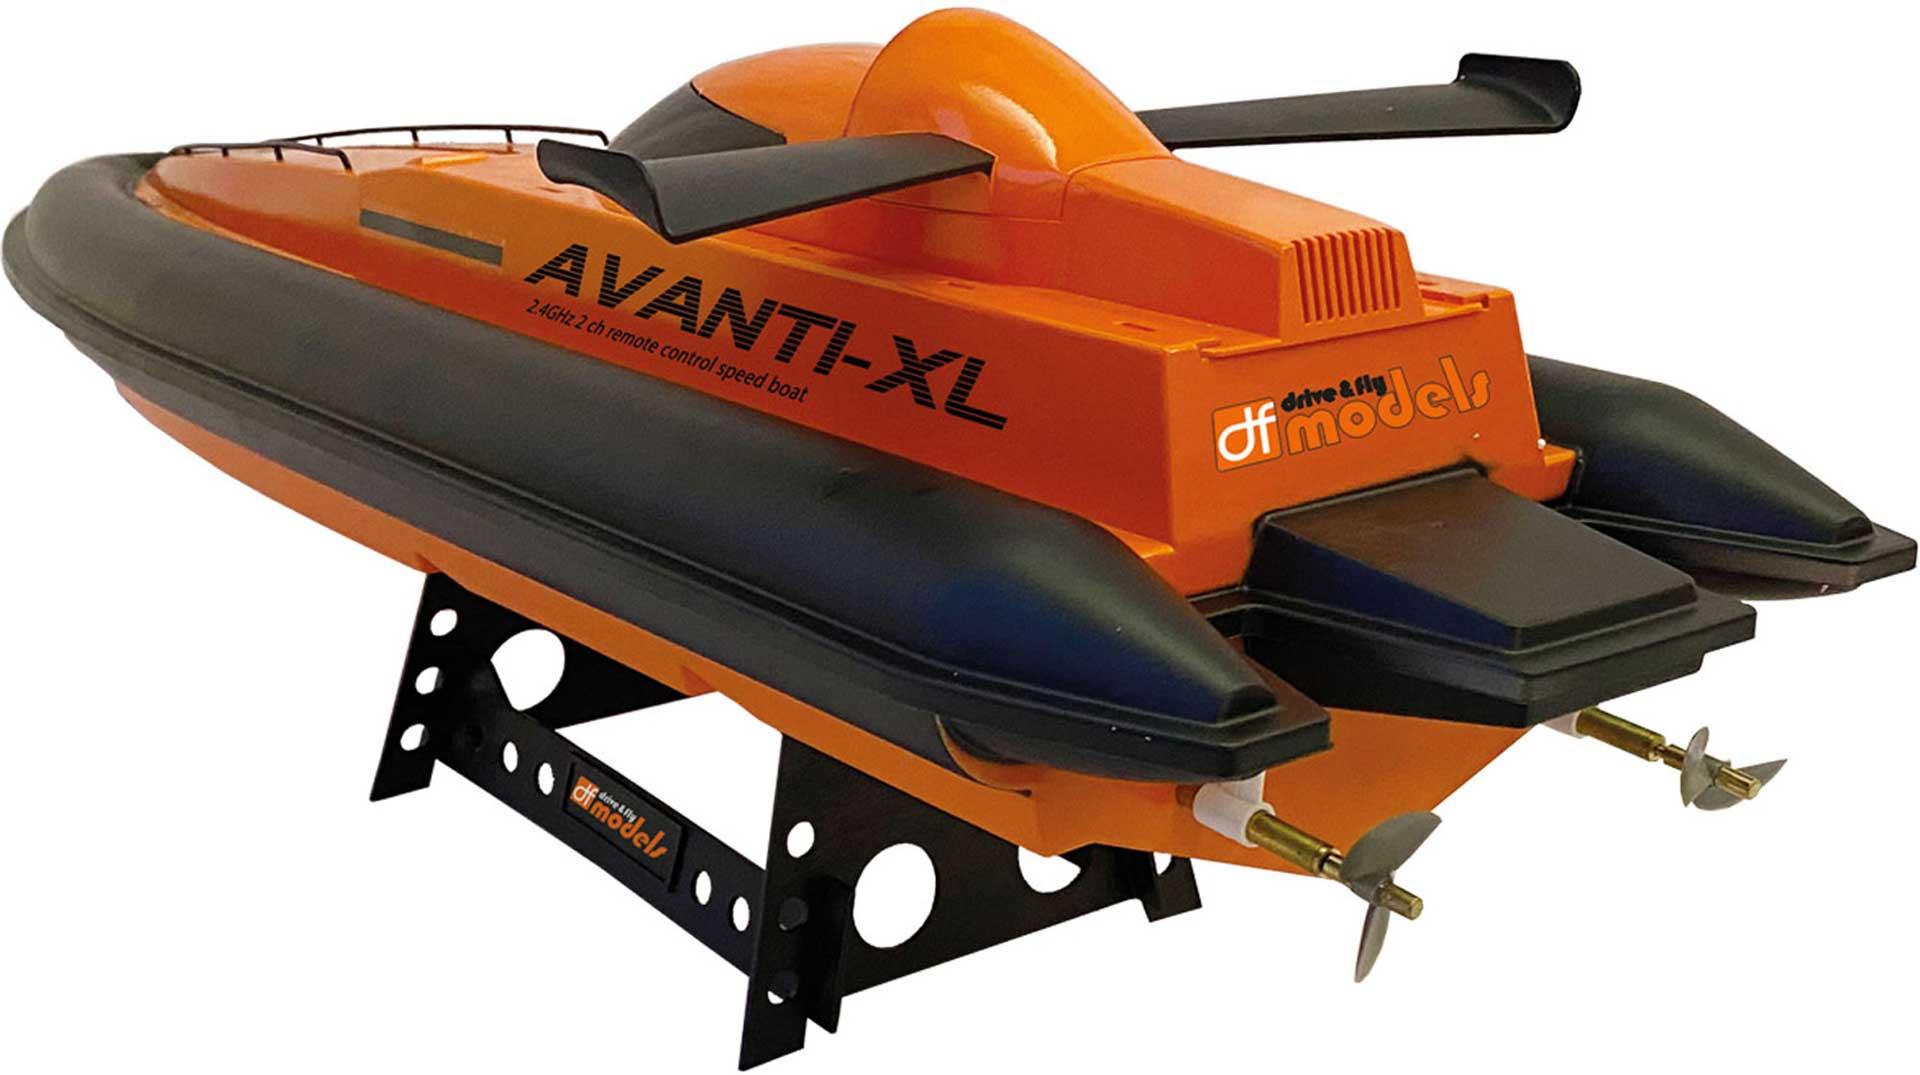 DRIVE & FLY MODELS AVANTI-XL RACING BOAT RTR